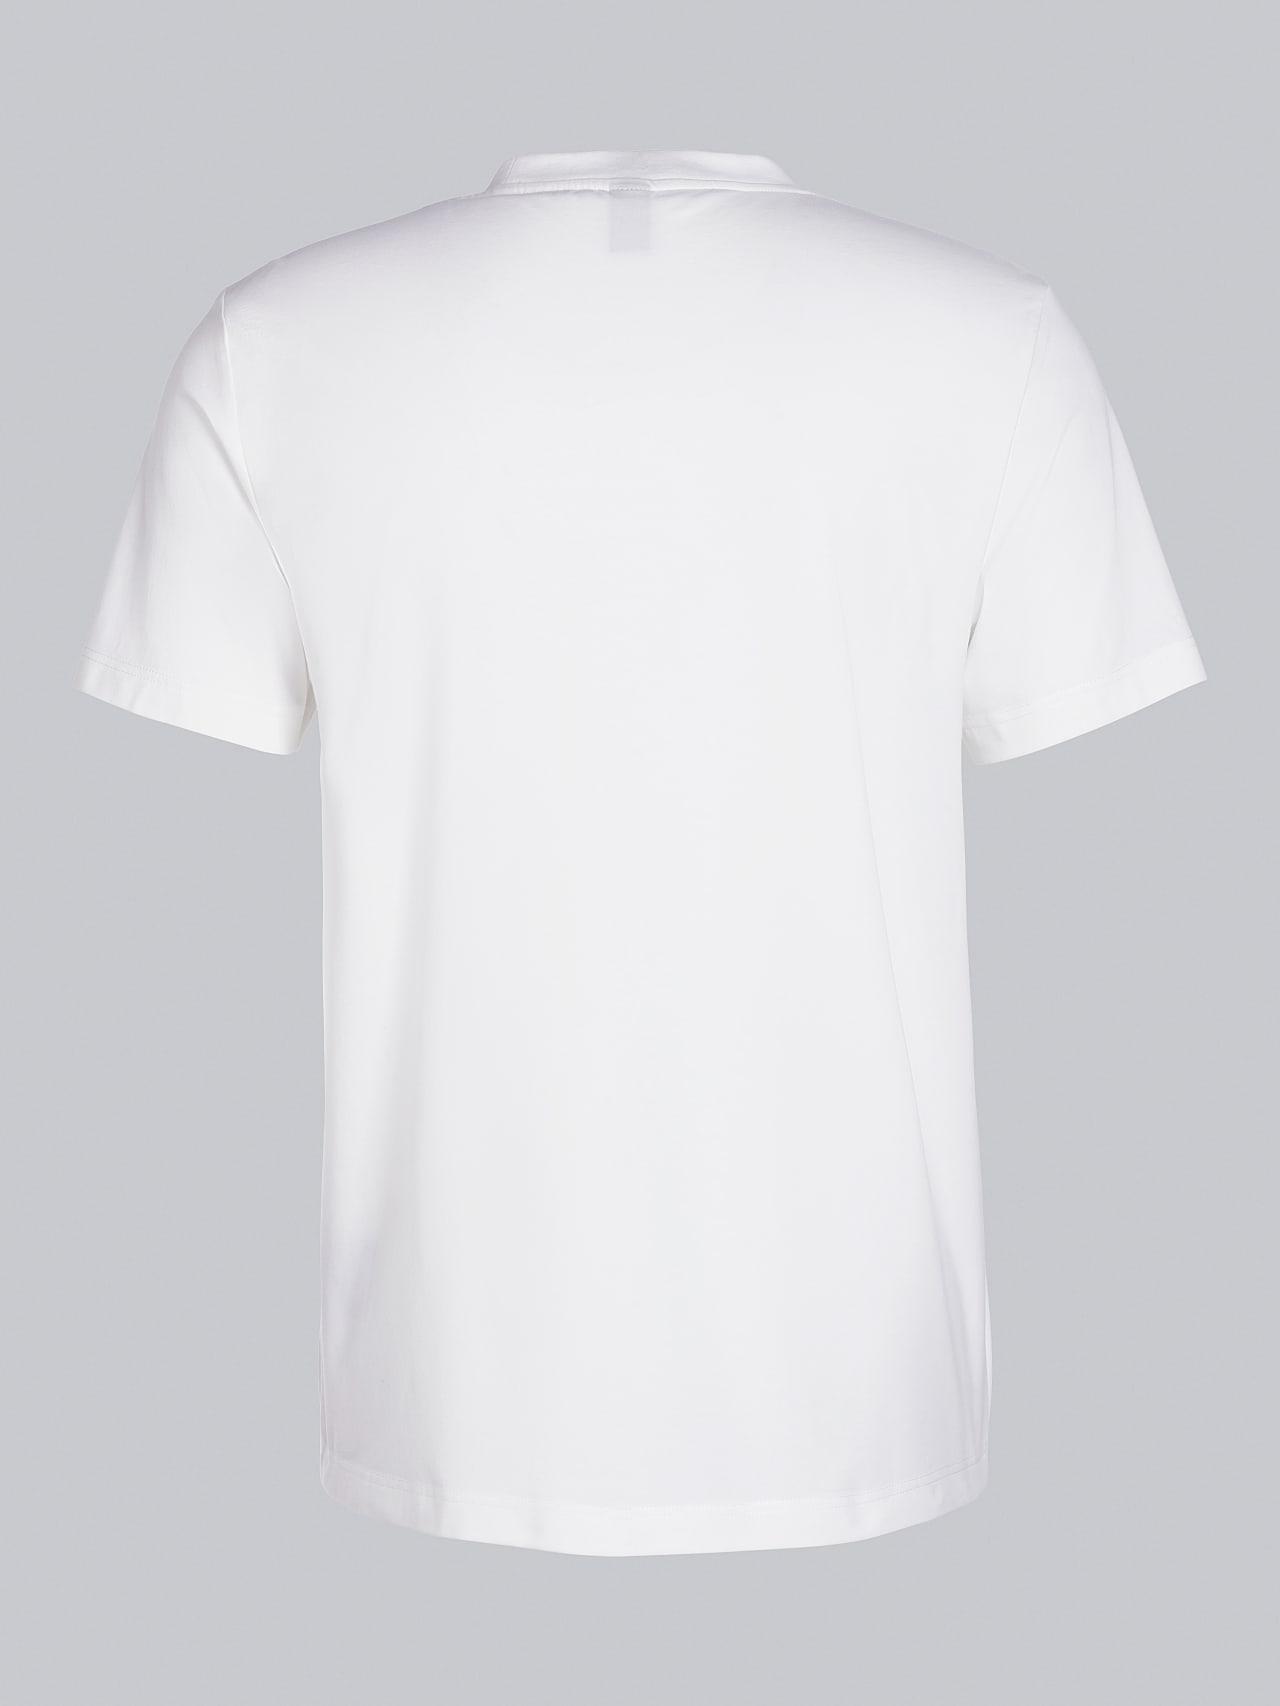 JANOS V3.Y5.02 Logo Embroidery T-Shirt offwhite Left Alpha Tauri